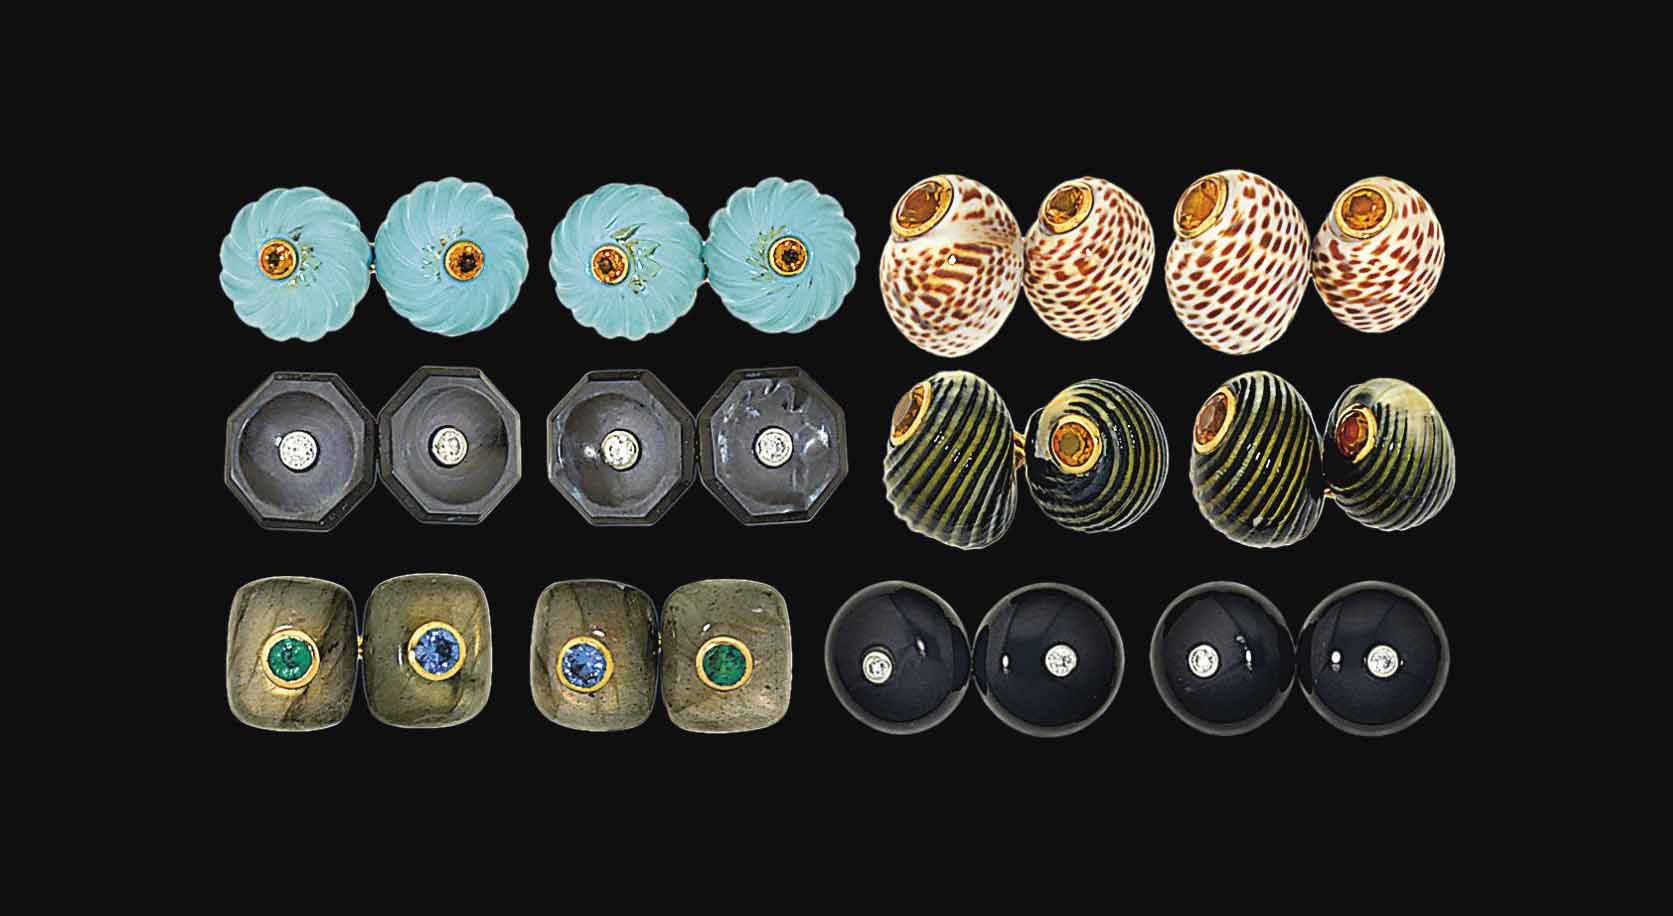 Six pairs of gem-set cufflinks, by Trianon